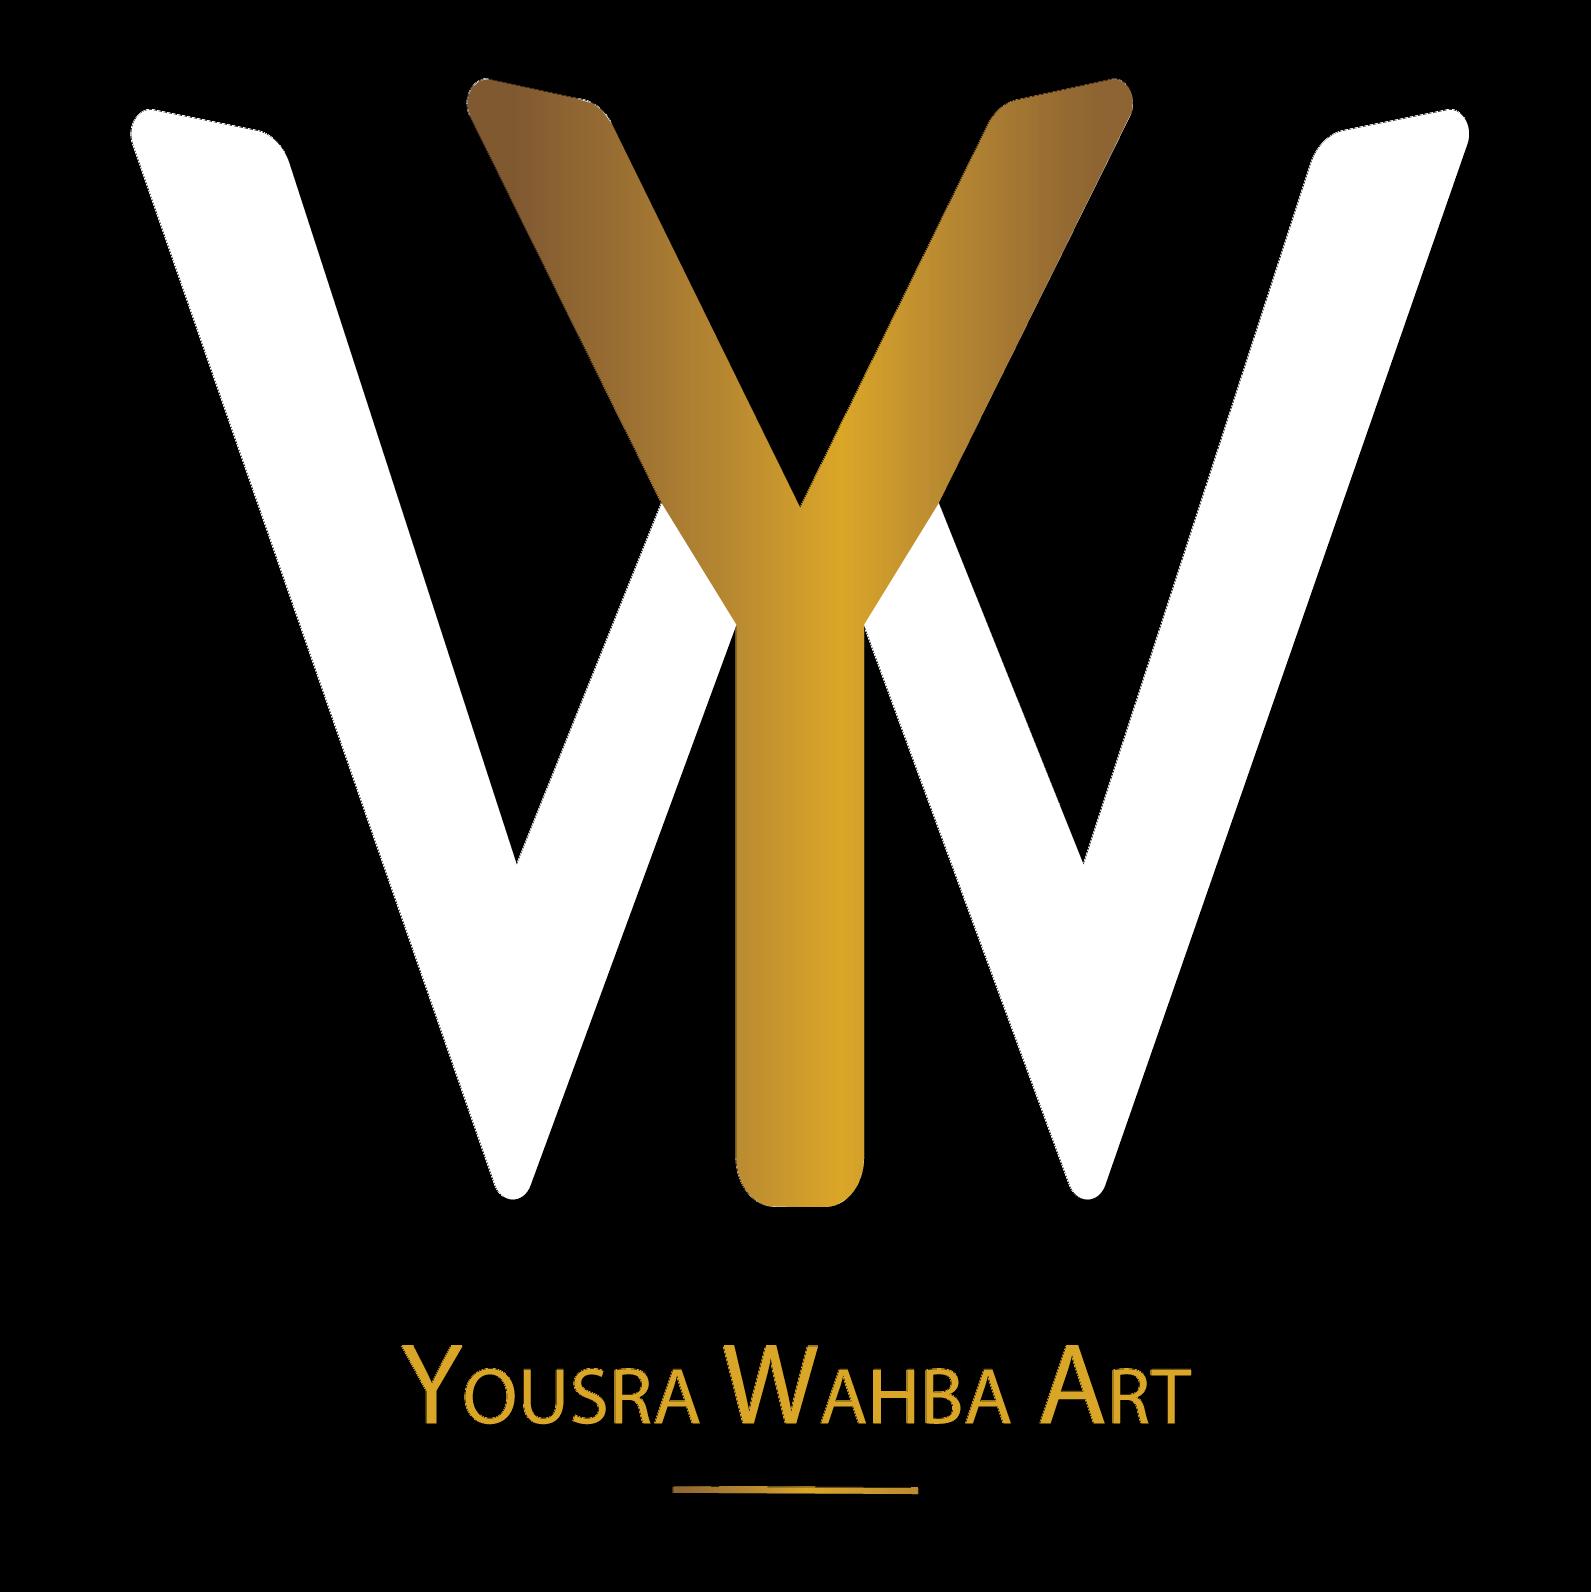 Yousra Wahba Art